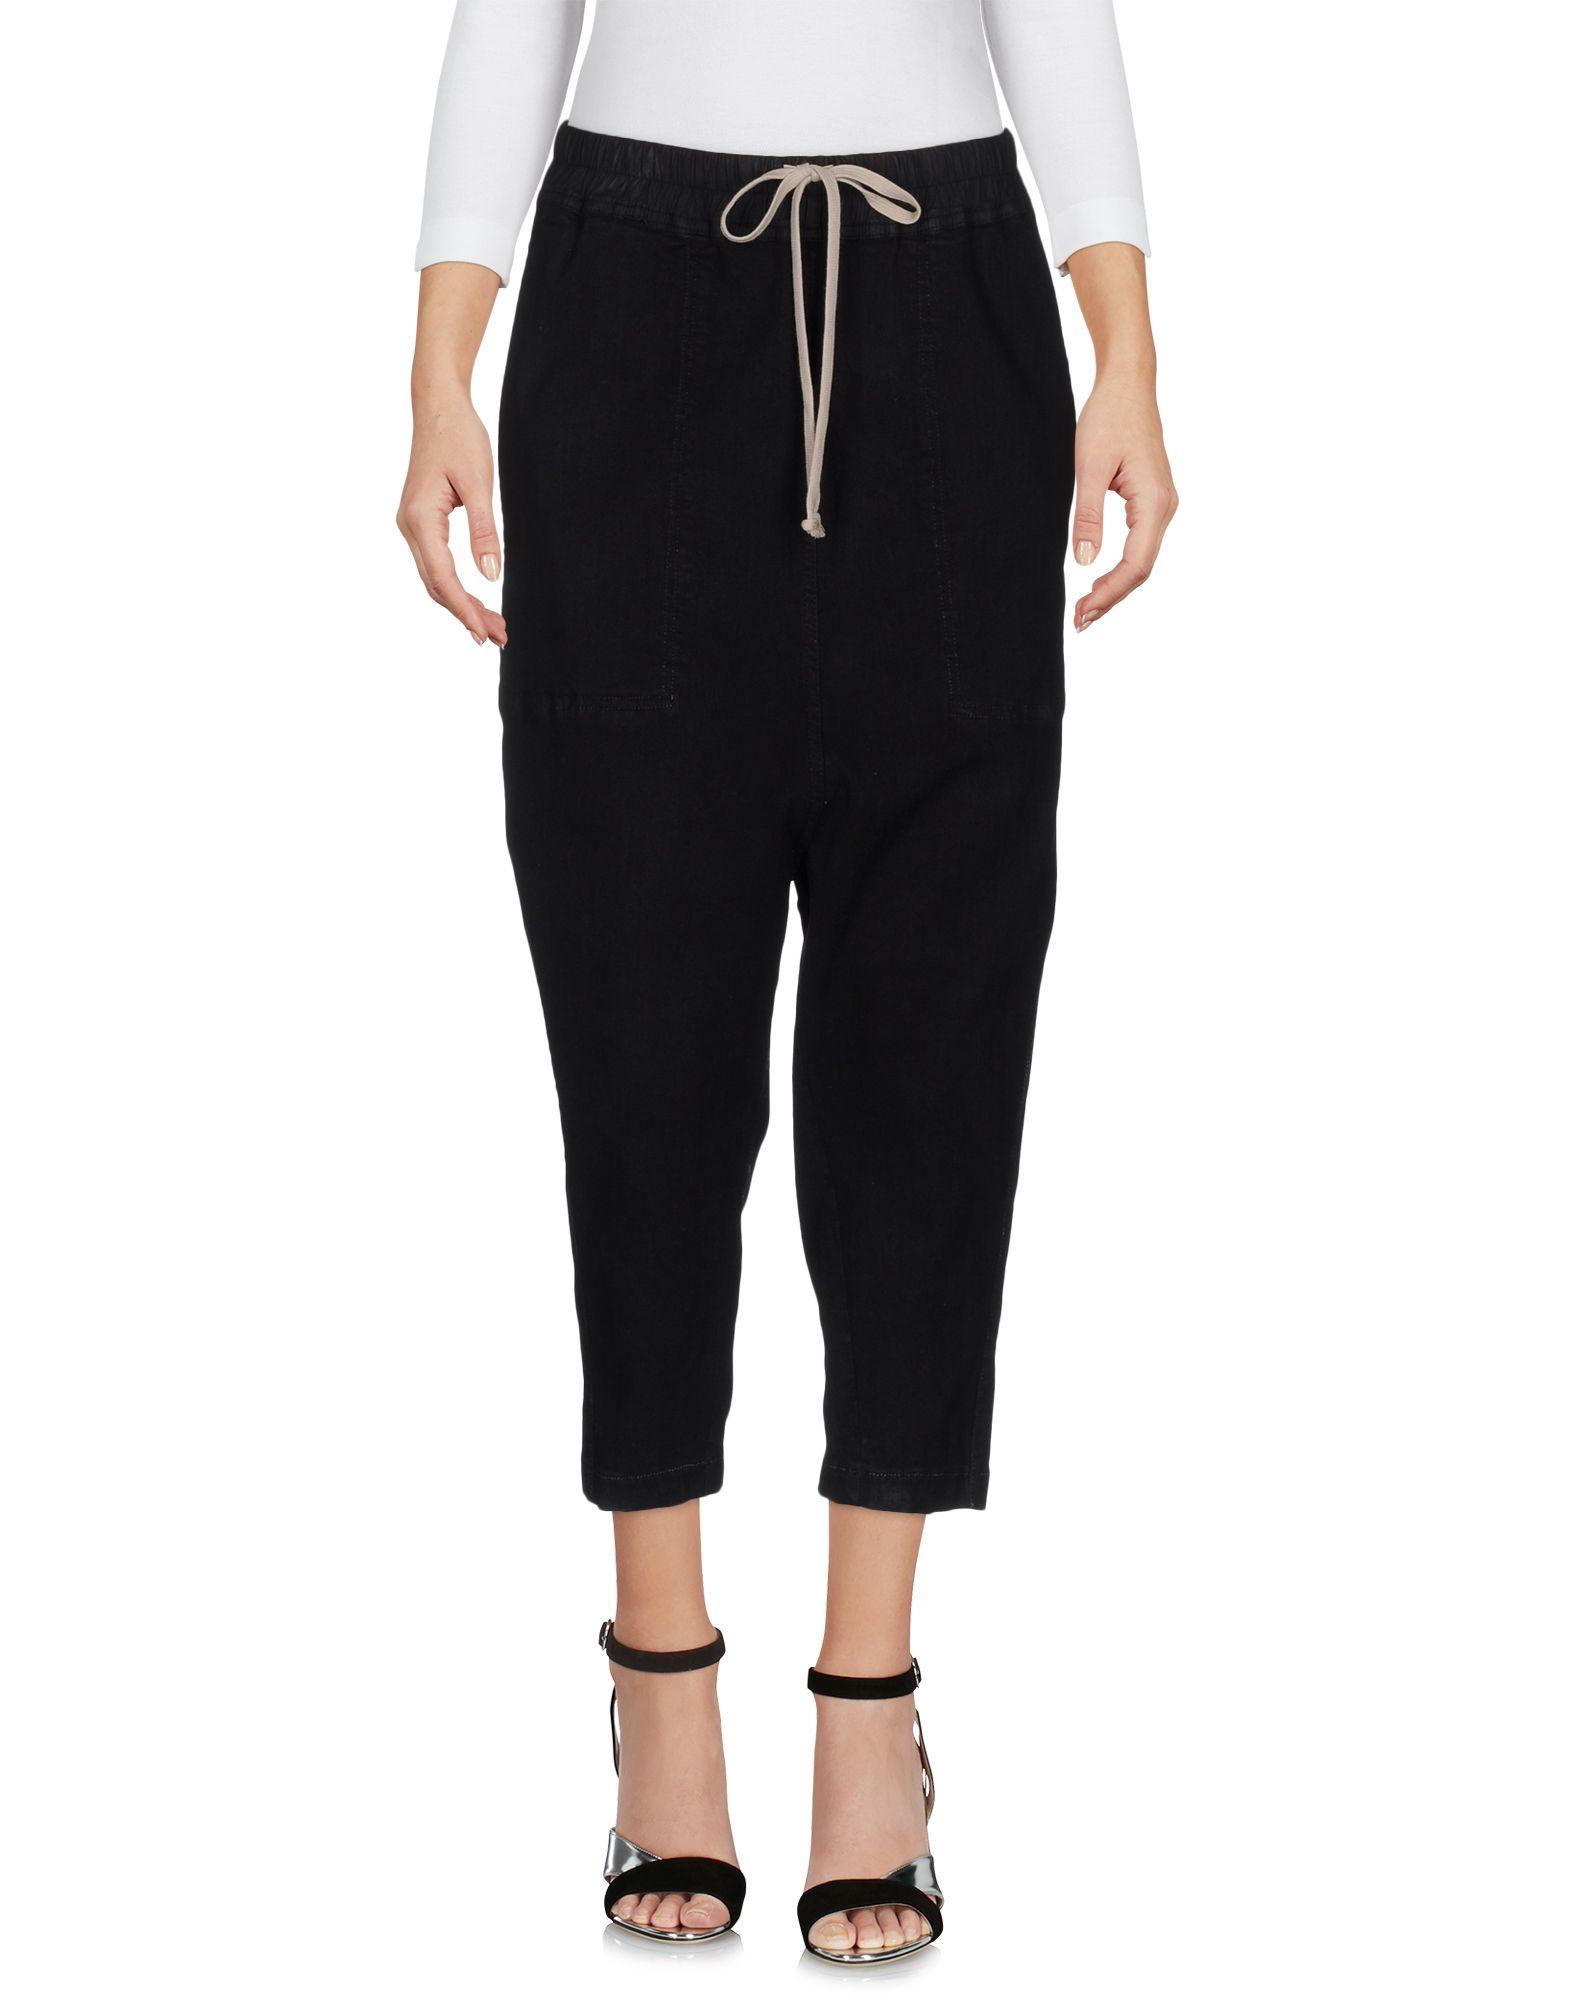 Pantaloni Jeans Drkshdw By Rick Owens Donna - Acquista online su YYyWnCU1Mz